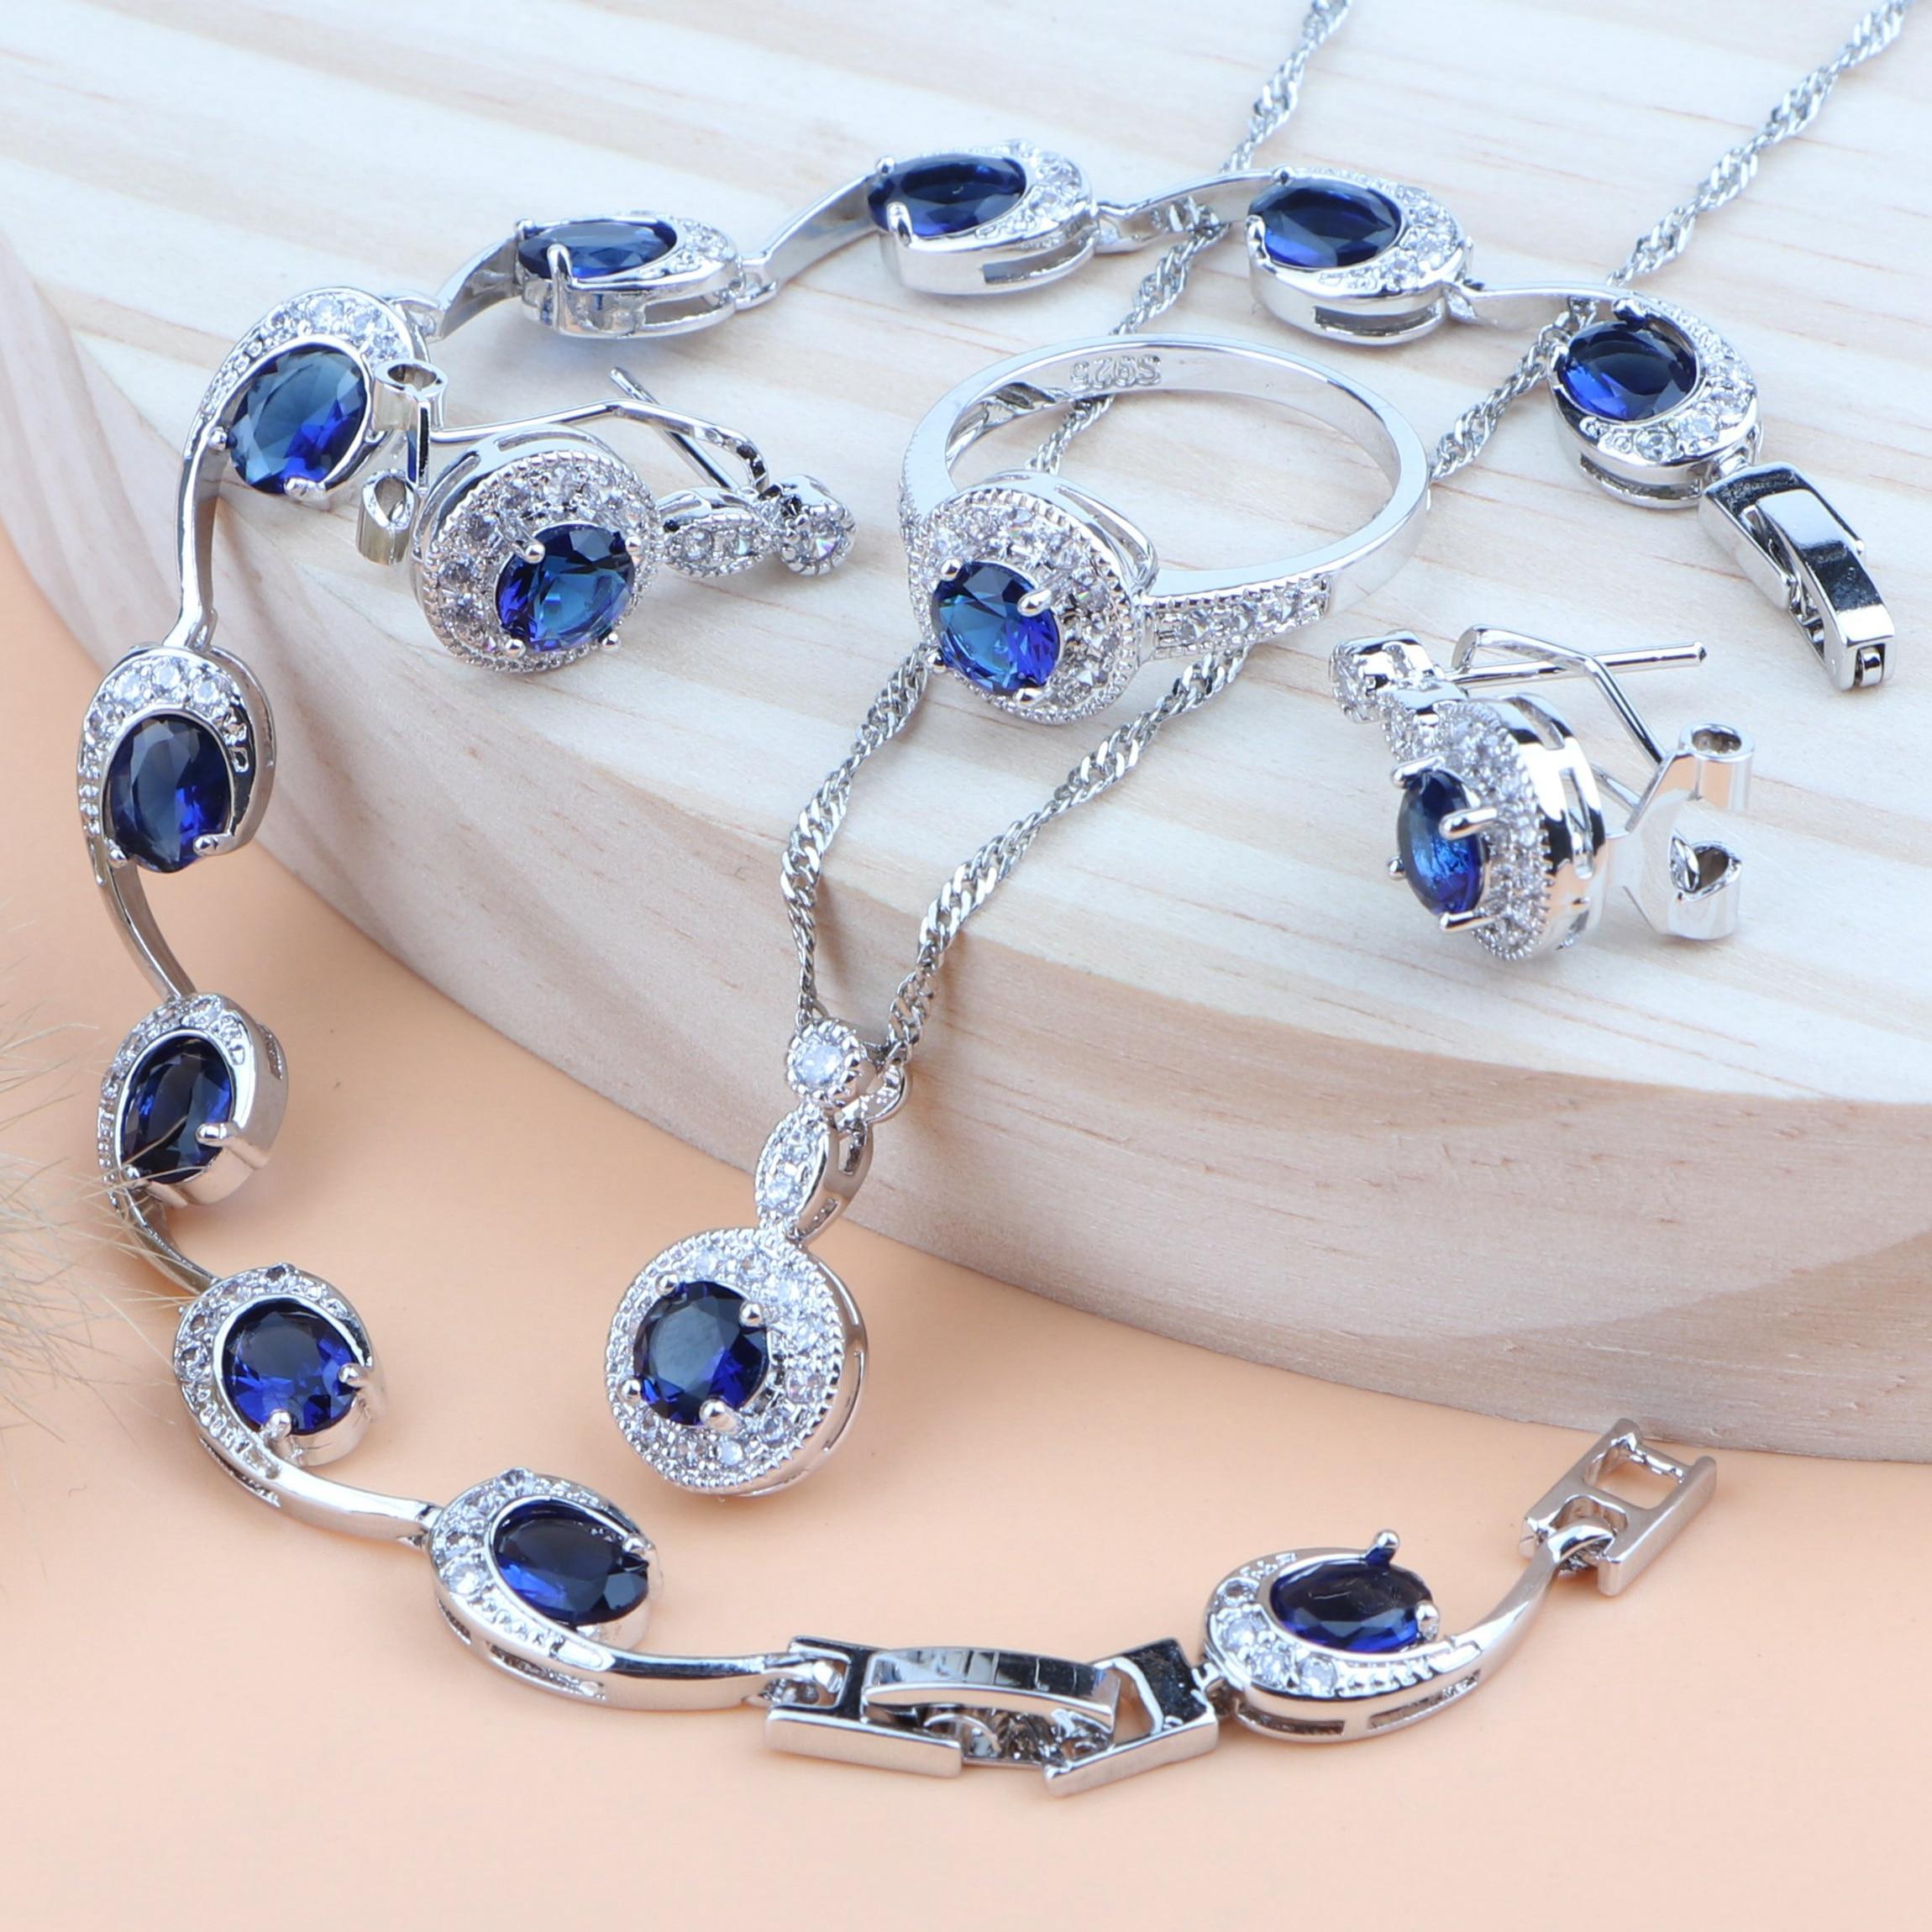 Blue Zirconia Jewelry Sets Silver 925 Wedding Bridal Jewelry For Women Costume Bracelet Rings Earrings Pendant Necklace Gift Box